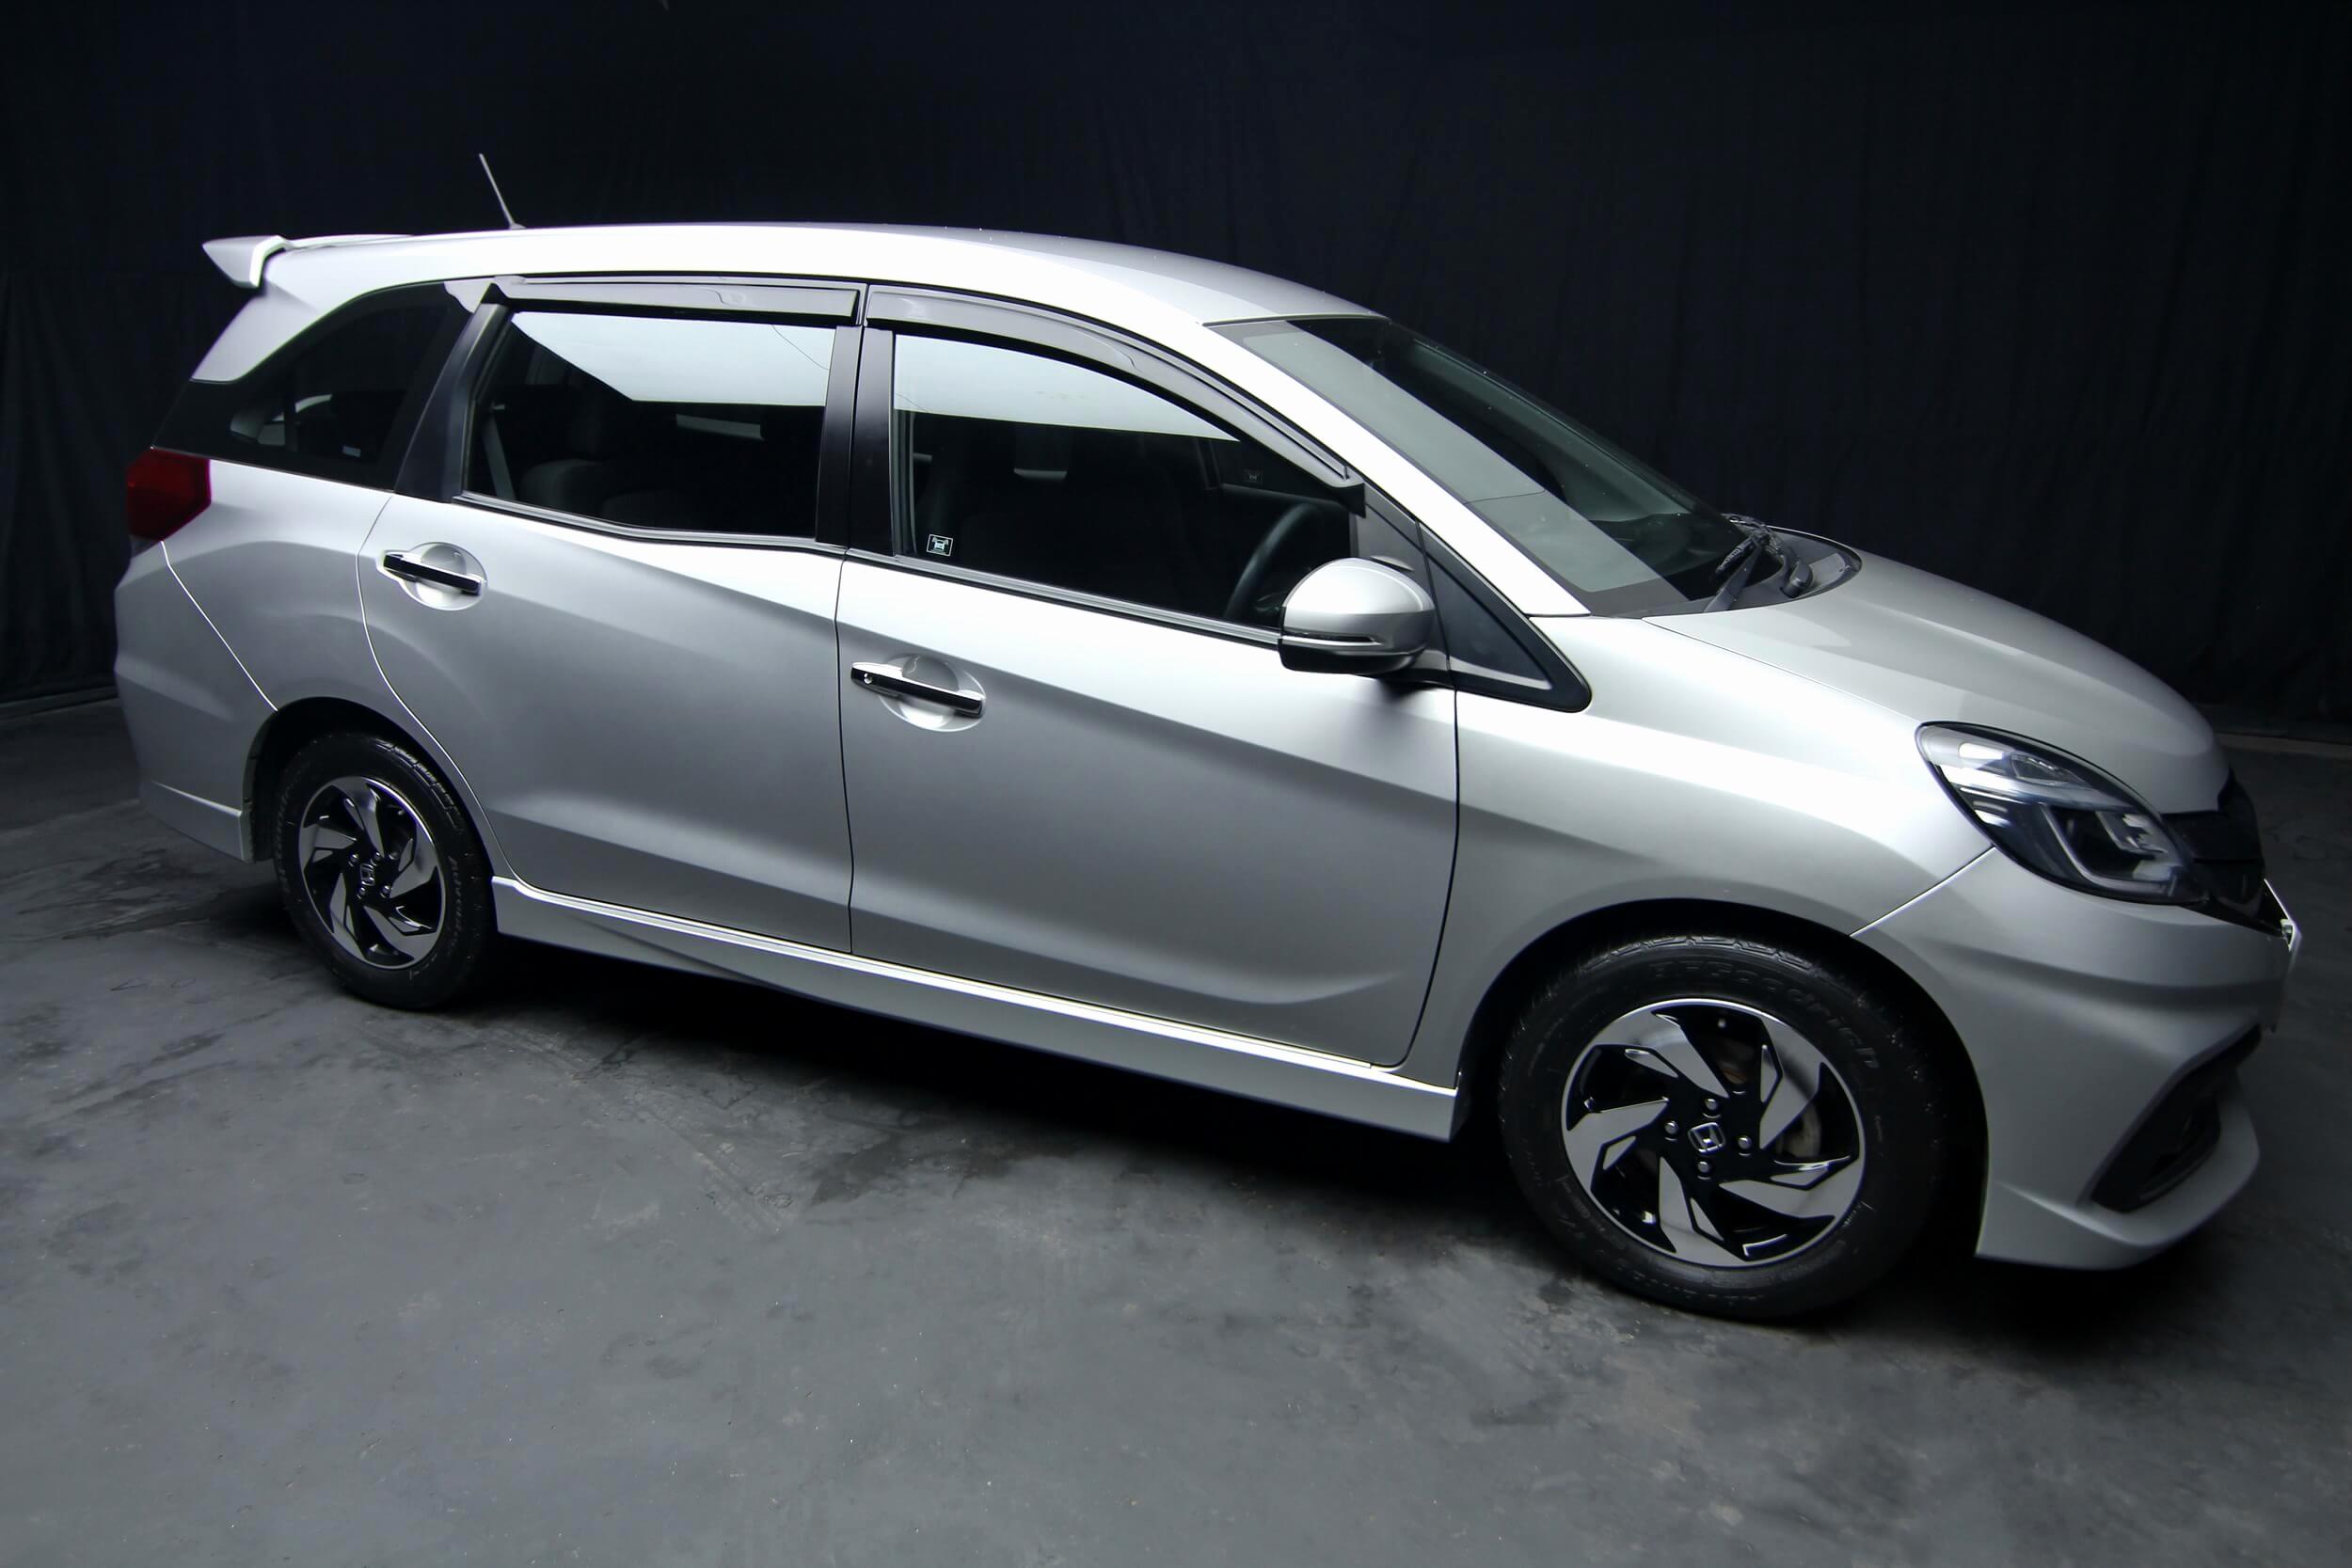 Honda Mobilio I Restyling 2004 - 2008 Compact MPV ...